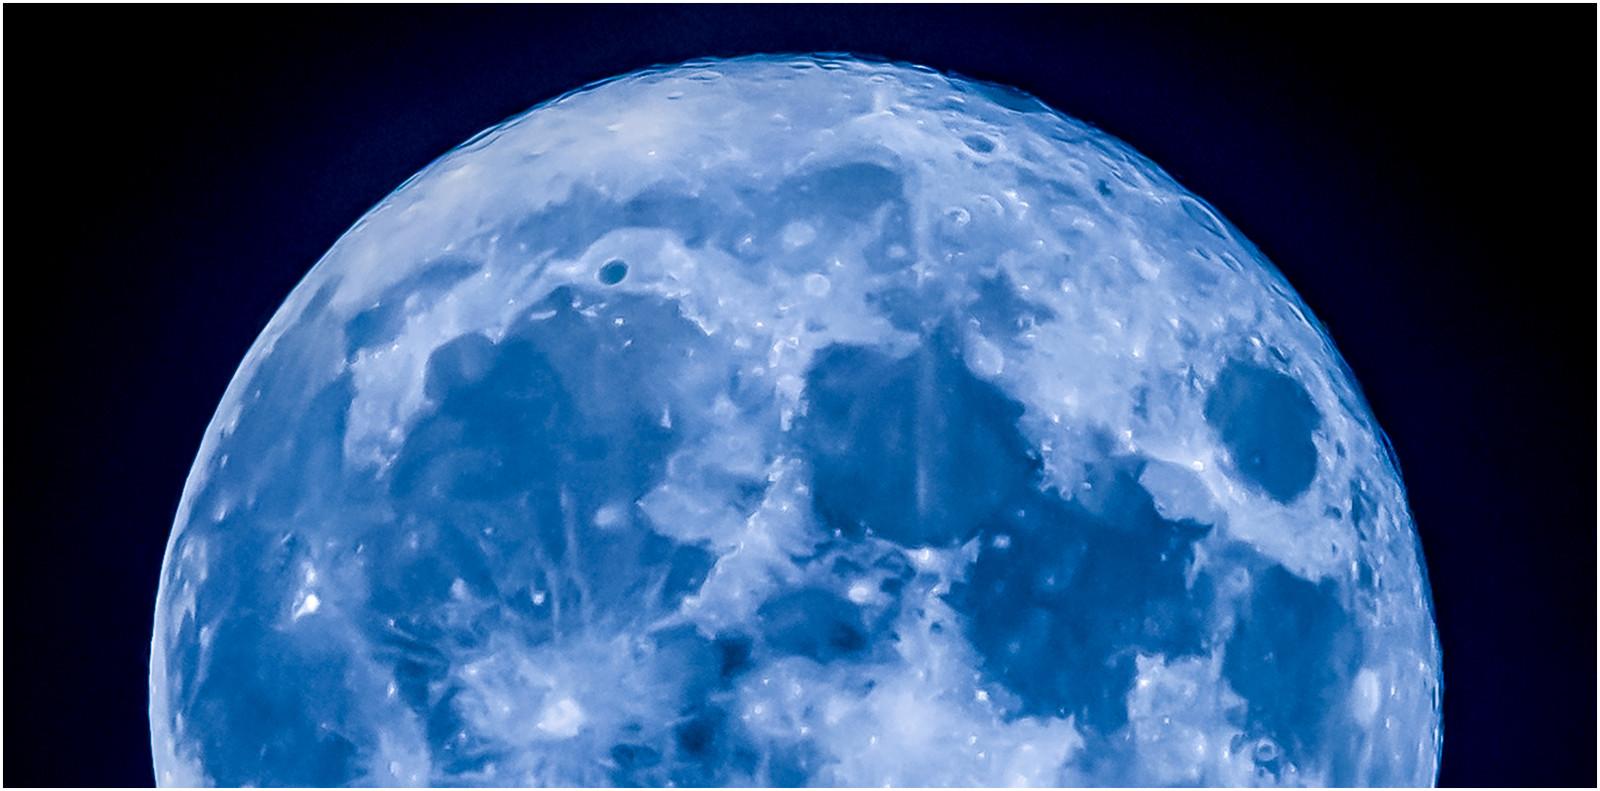 PDI - Blue Moon - Dean Martin by Brendan Hinds (6 marks)